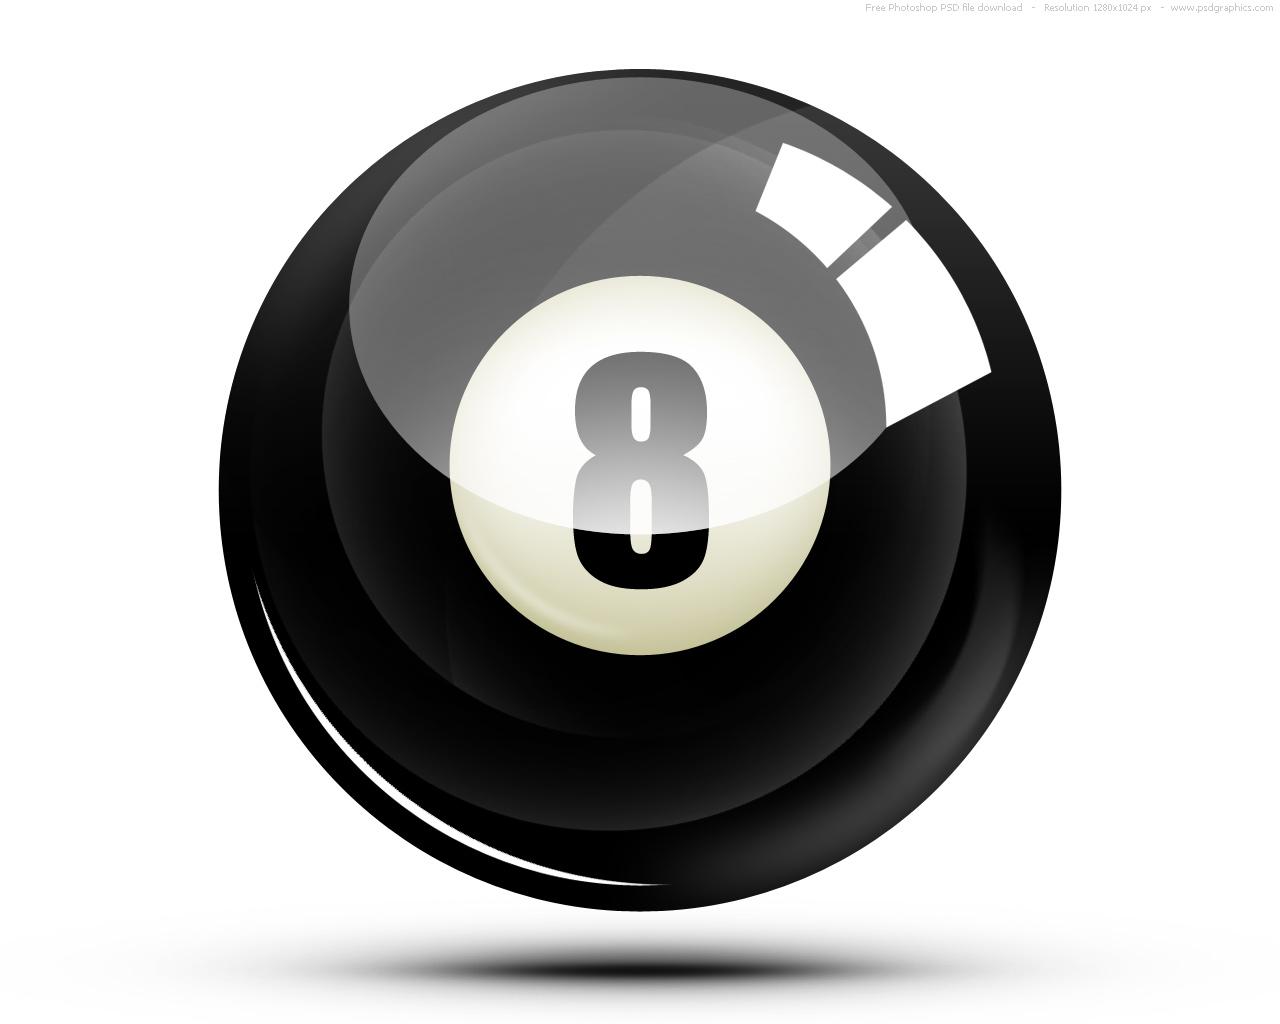 1280x1024 Psd Eight Ball Icon Psdgraphics